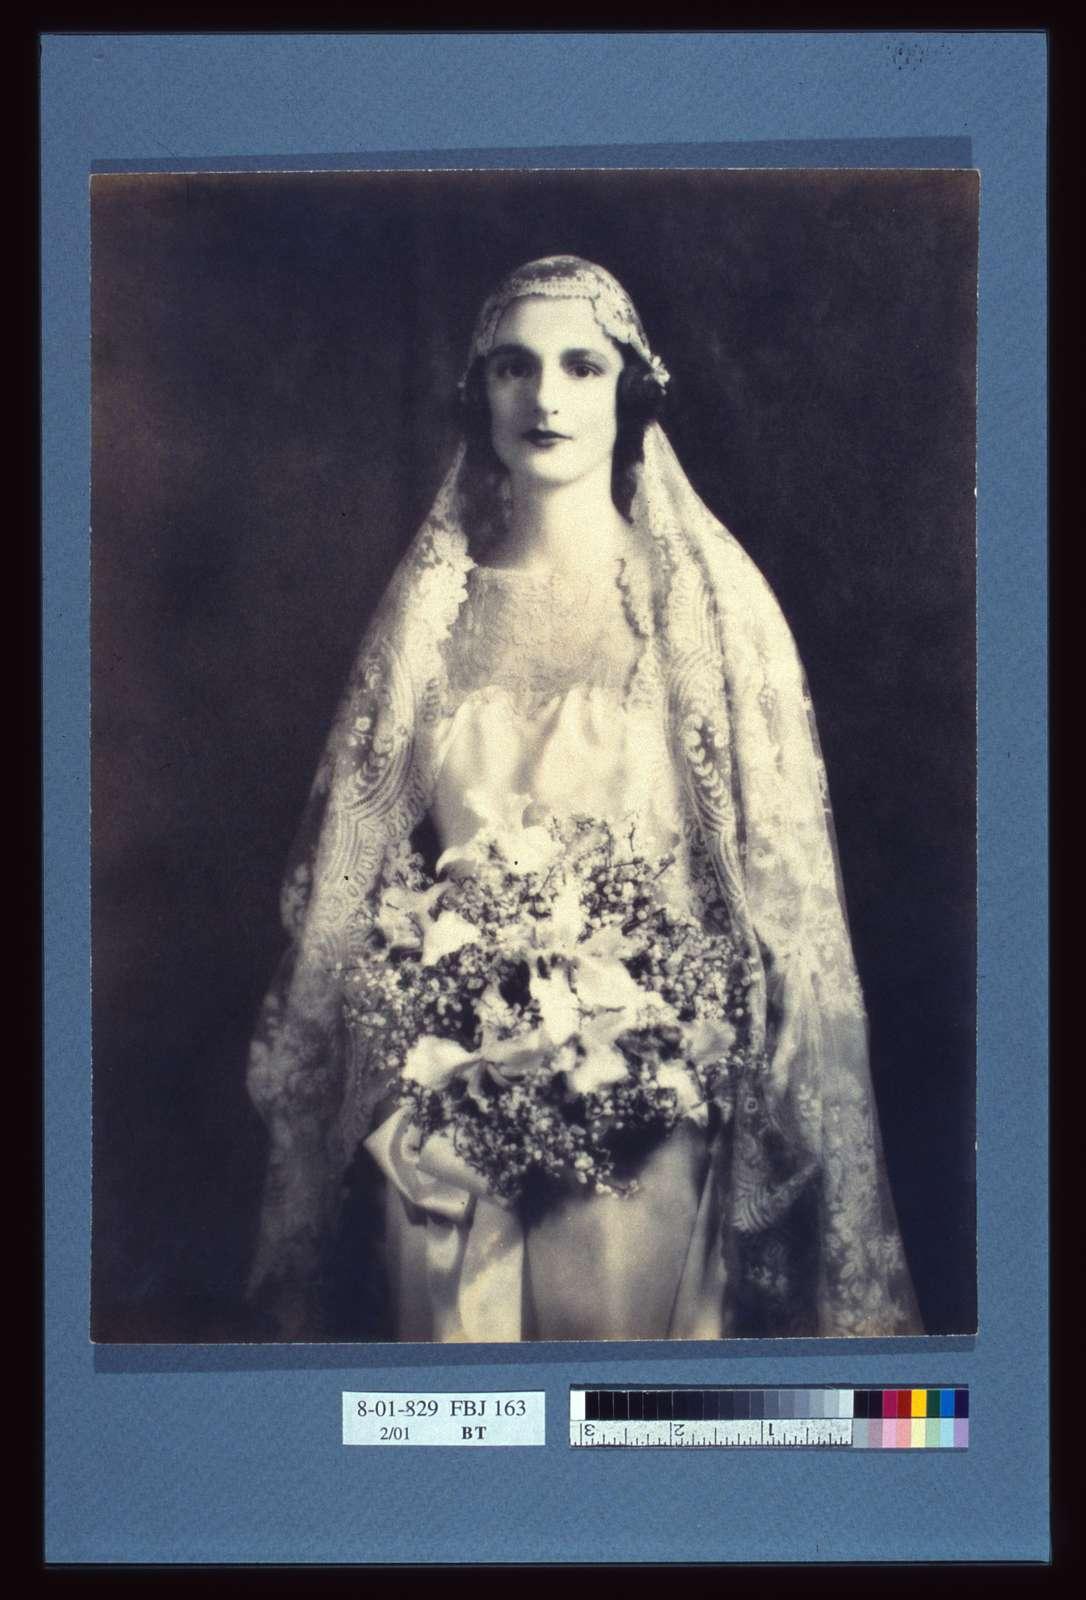 [Bride holding a wedding bouquet, facing front, three-quarter length portrait]